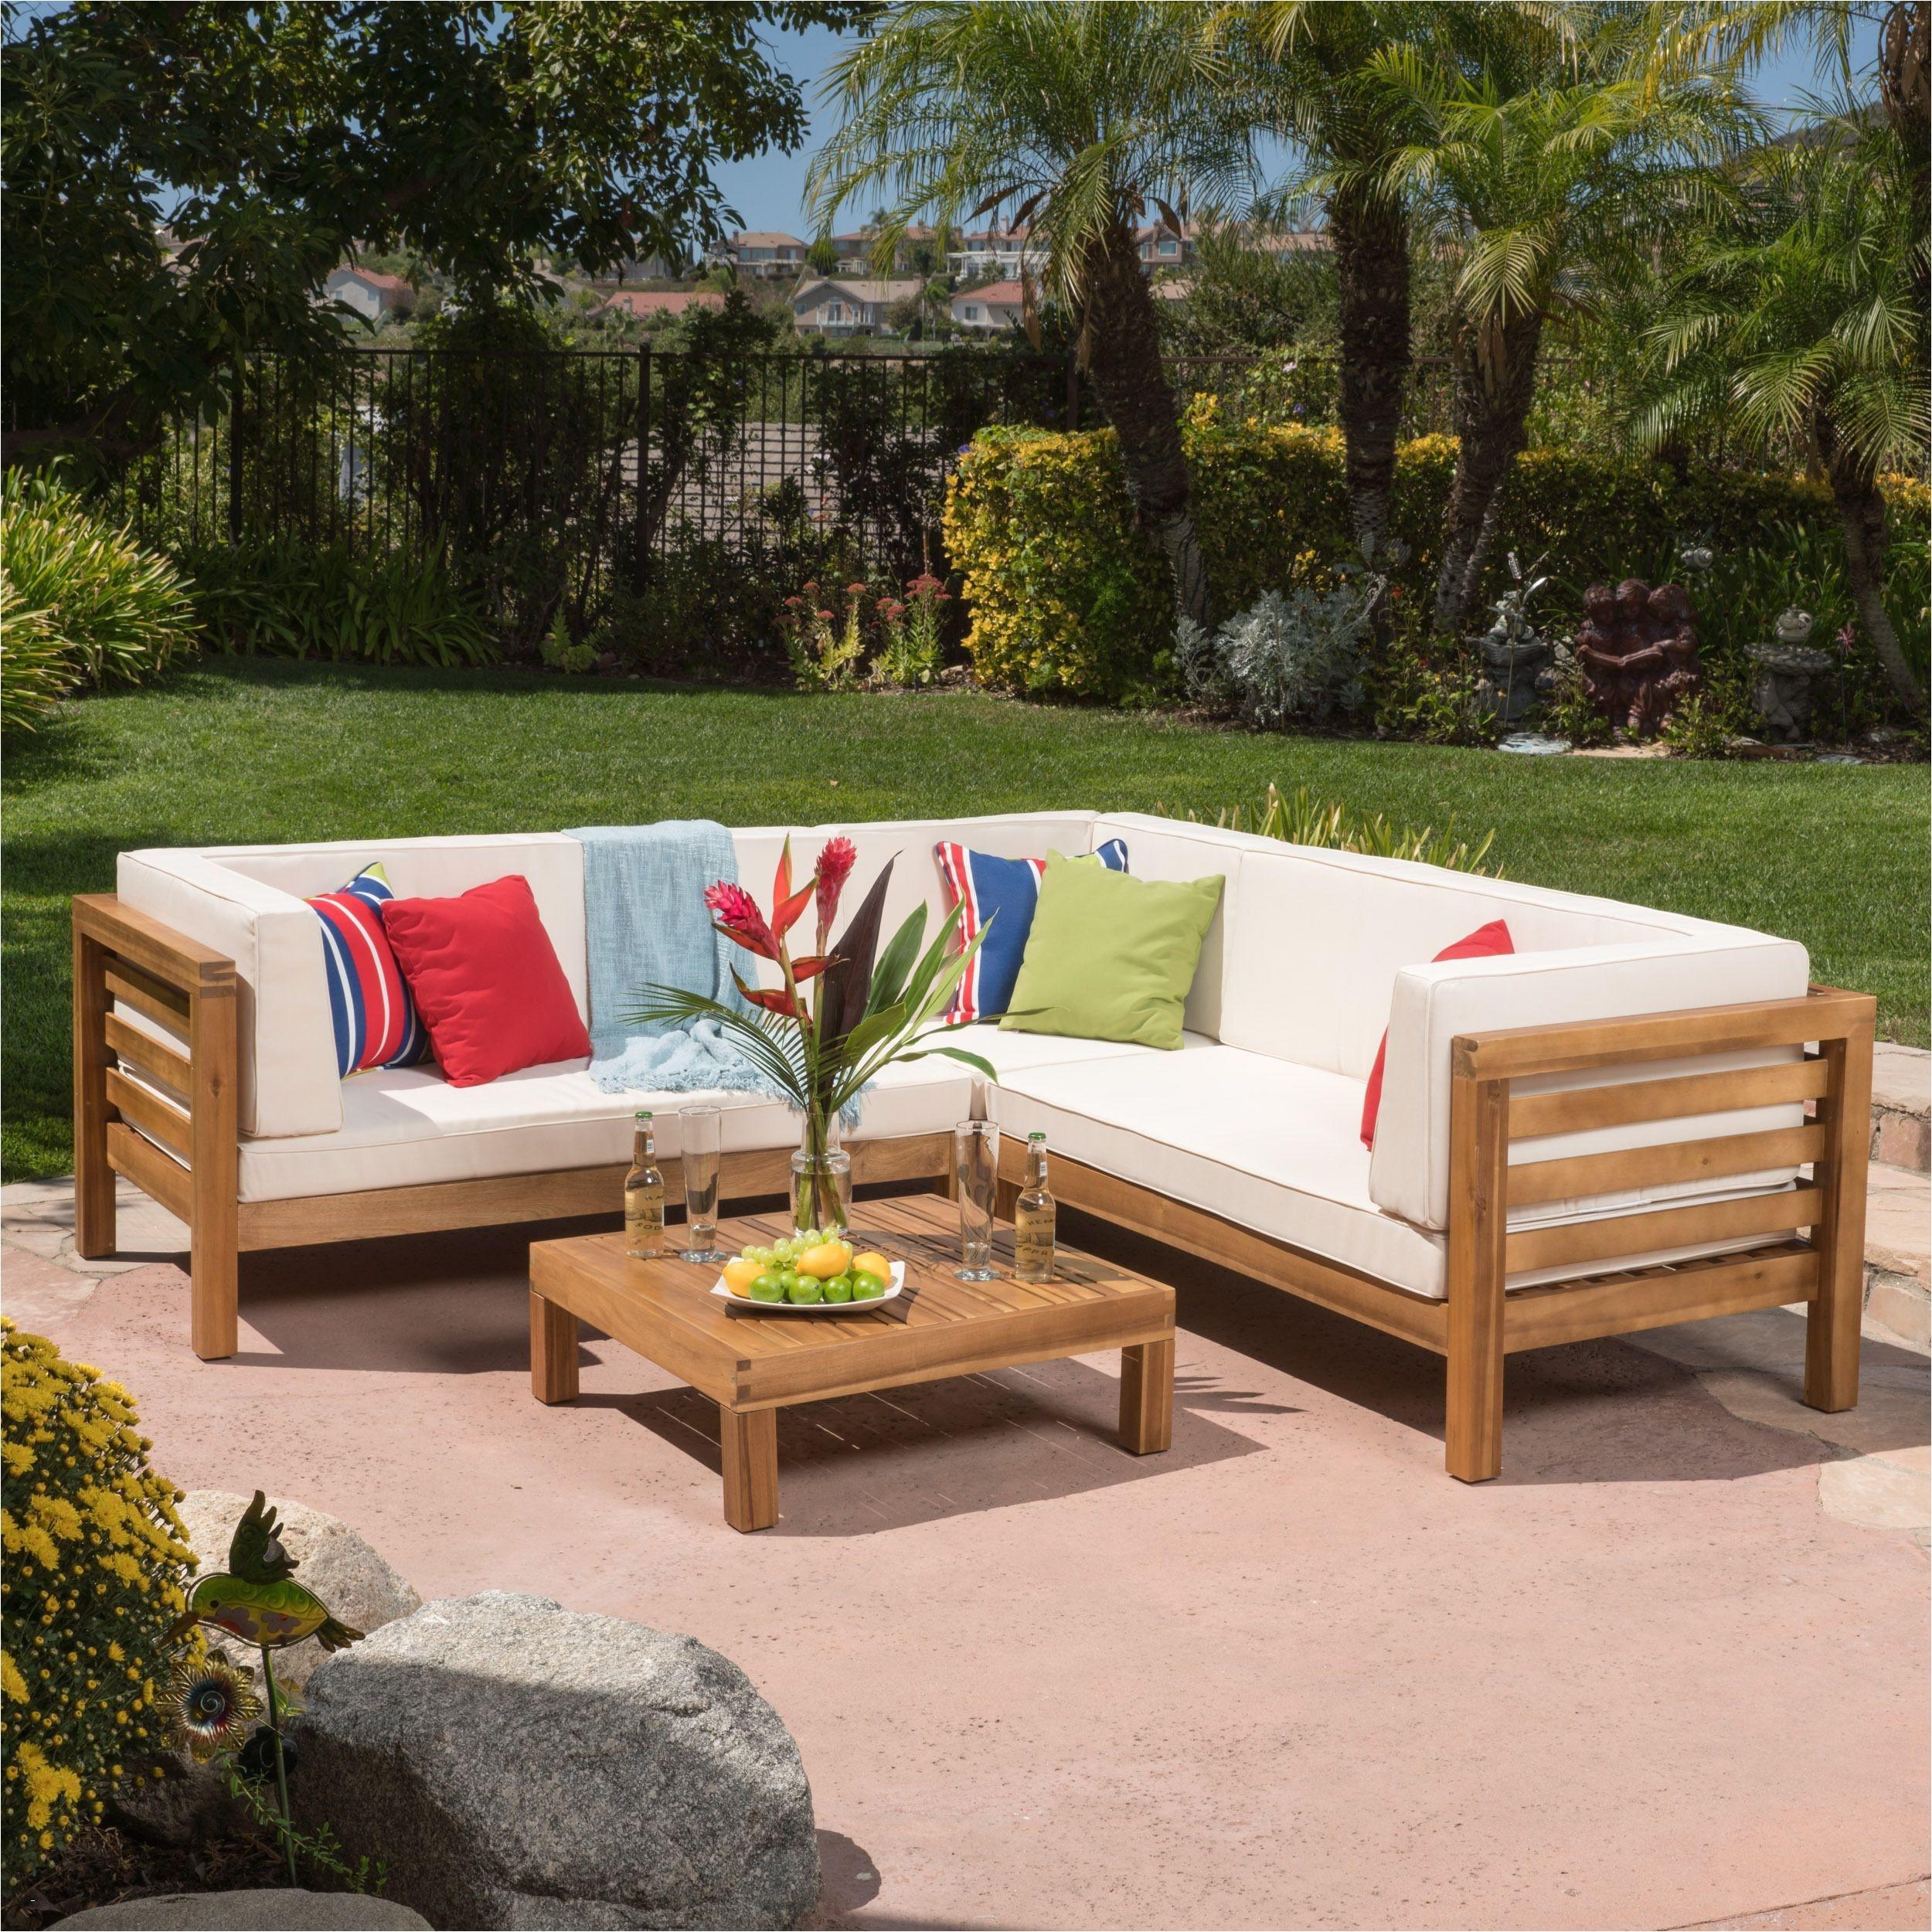 patio furniture sectionals fresh patio furniture cushion sets unique wicker outdoor sofa 0d patio